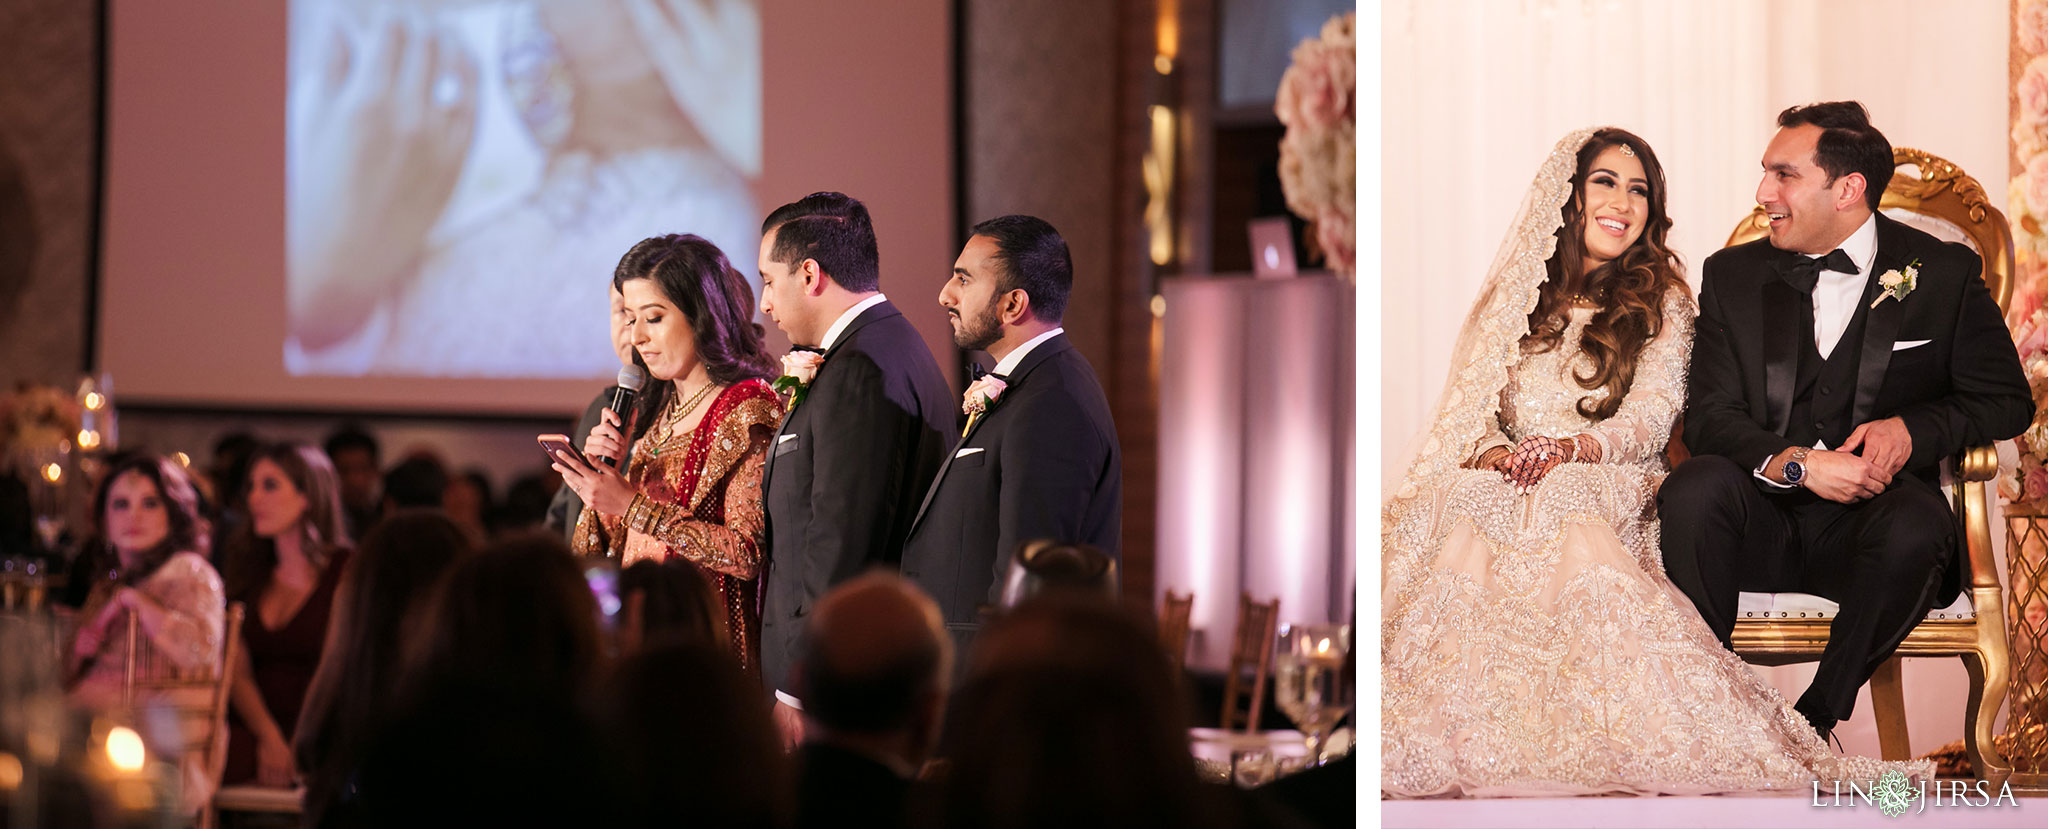 39 pasea hotel spa huntington beach pakistani muslim wedding photography